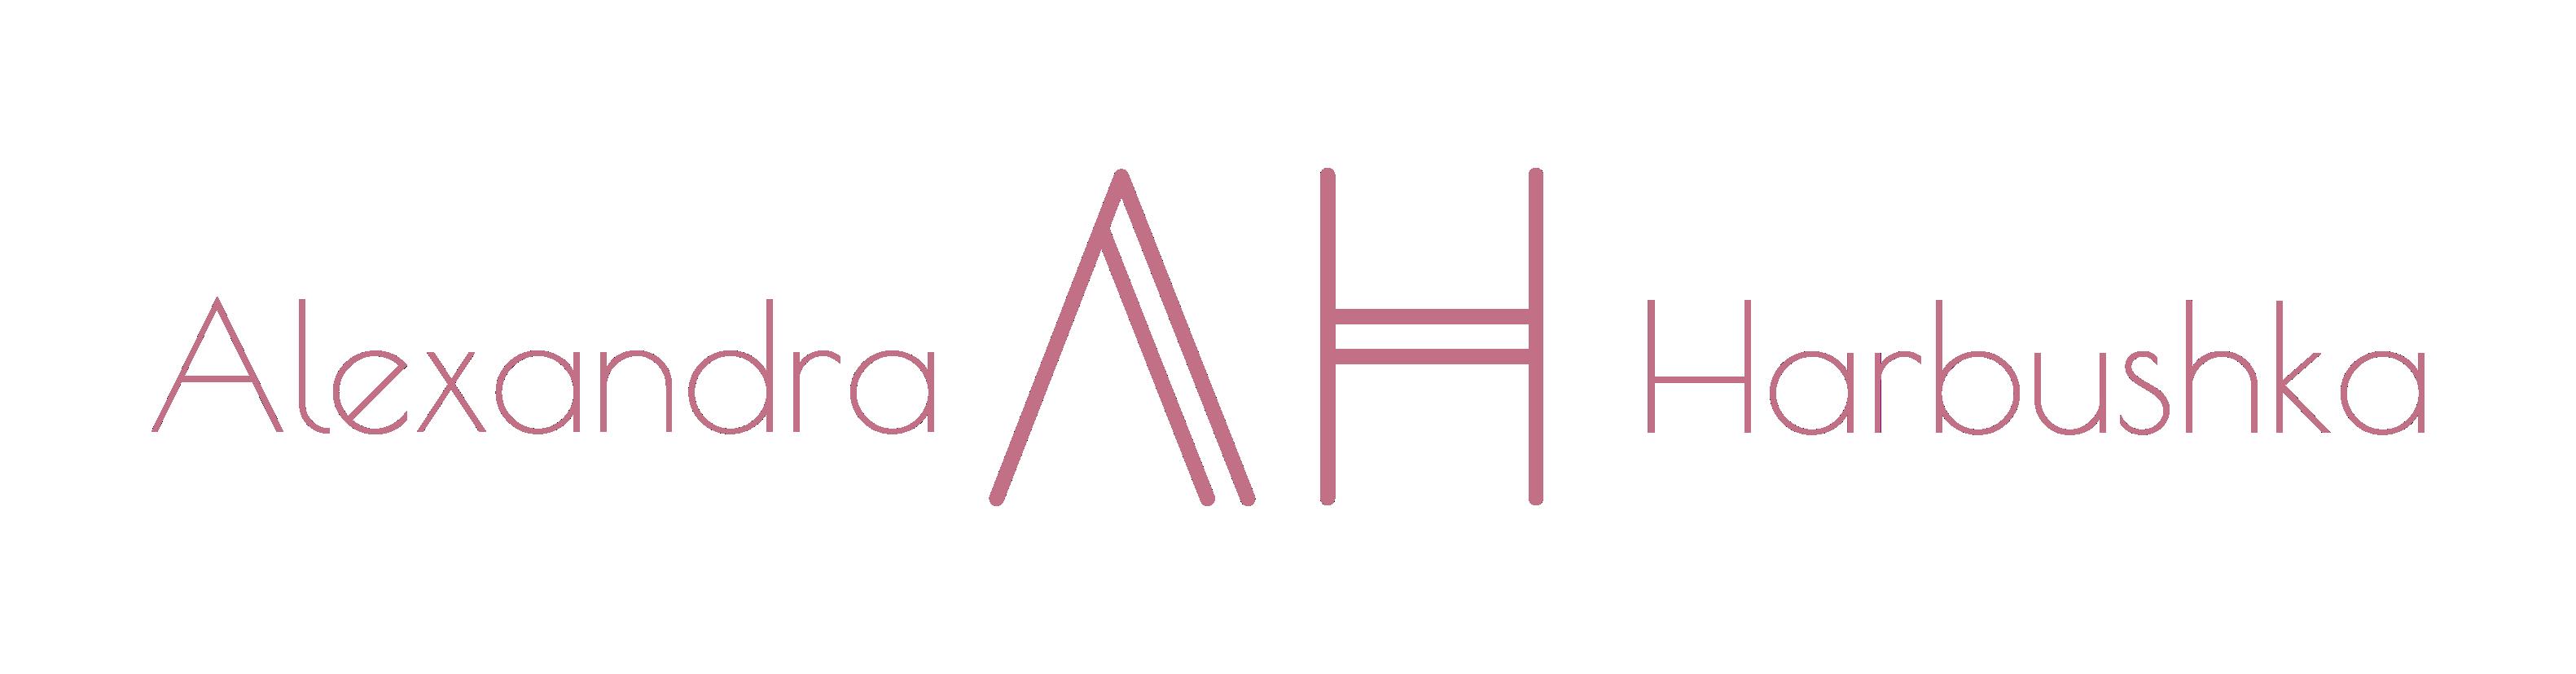 Alexandra Harbushka Lifestyle, LLC.